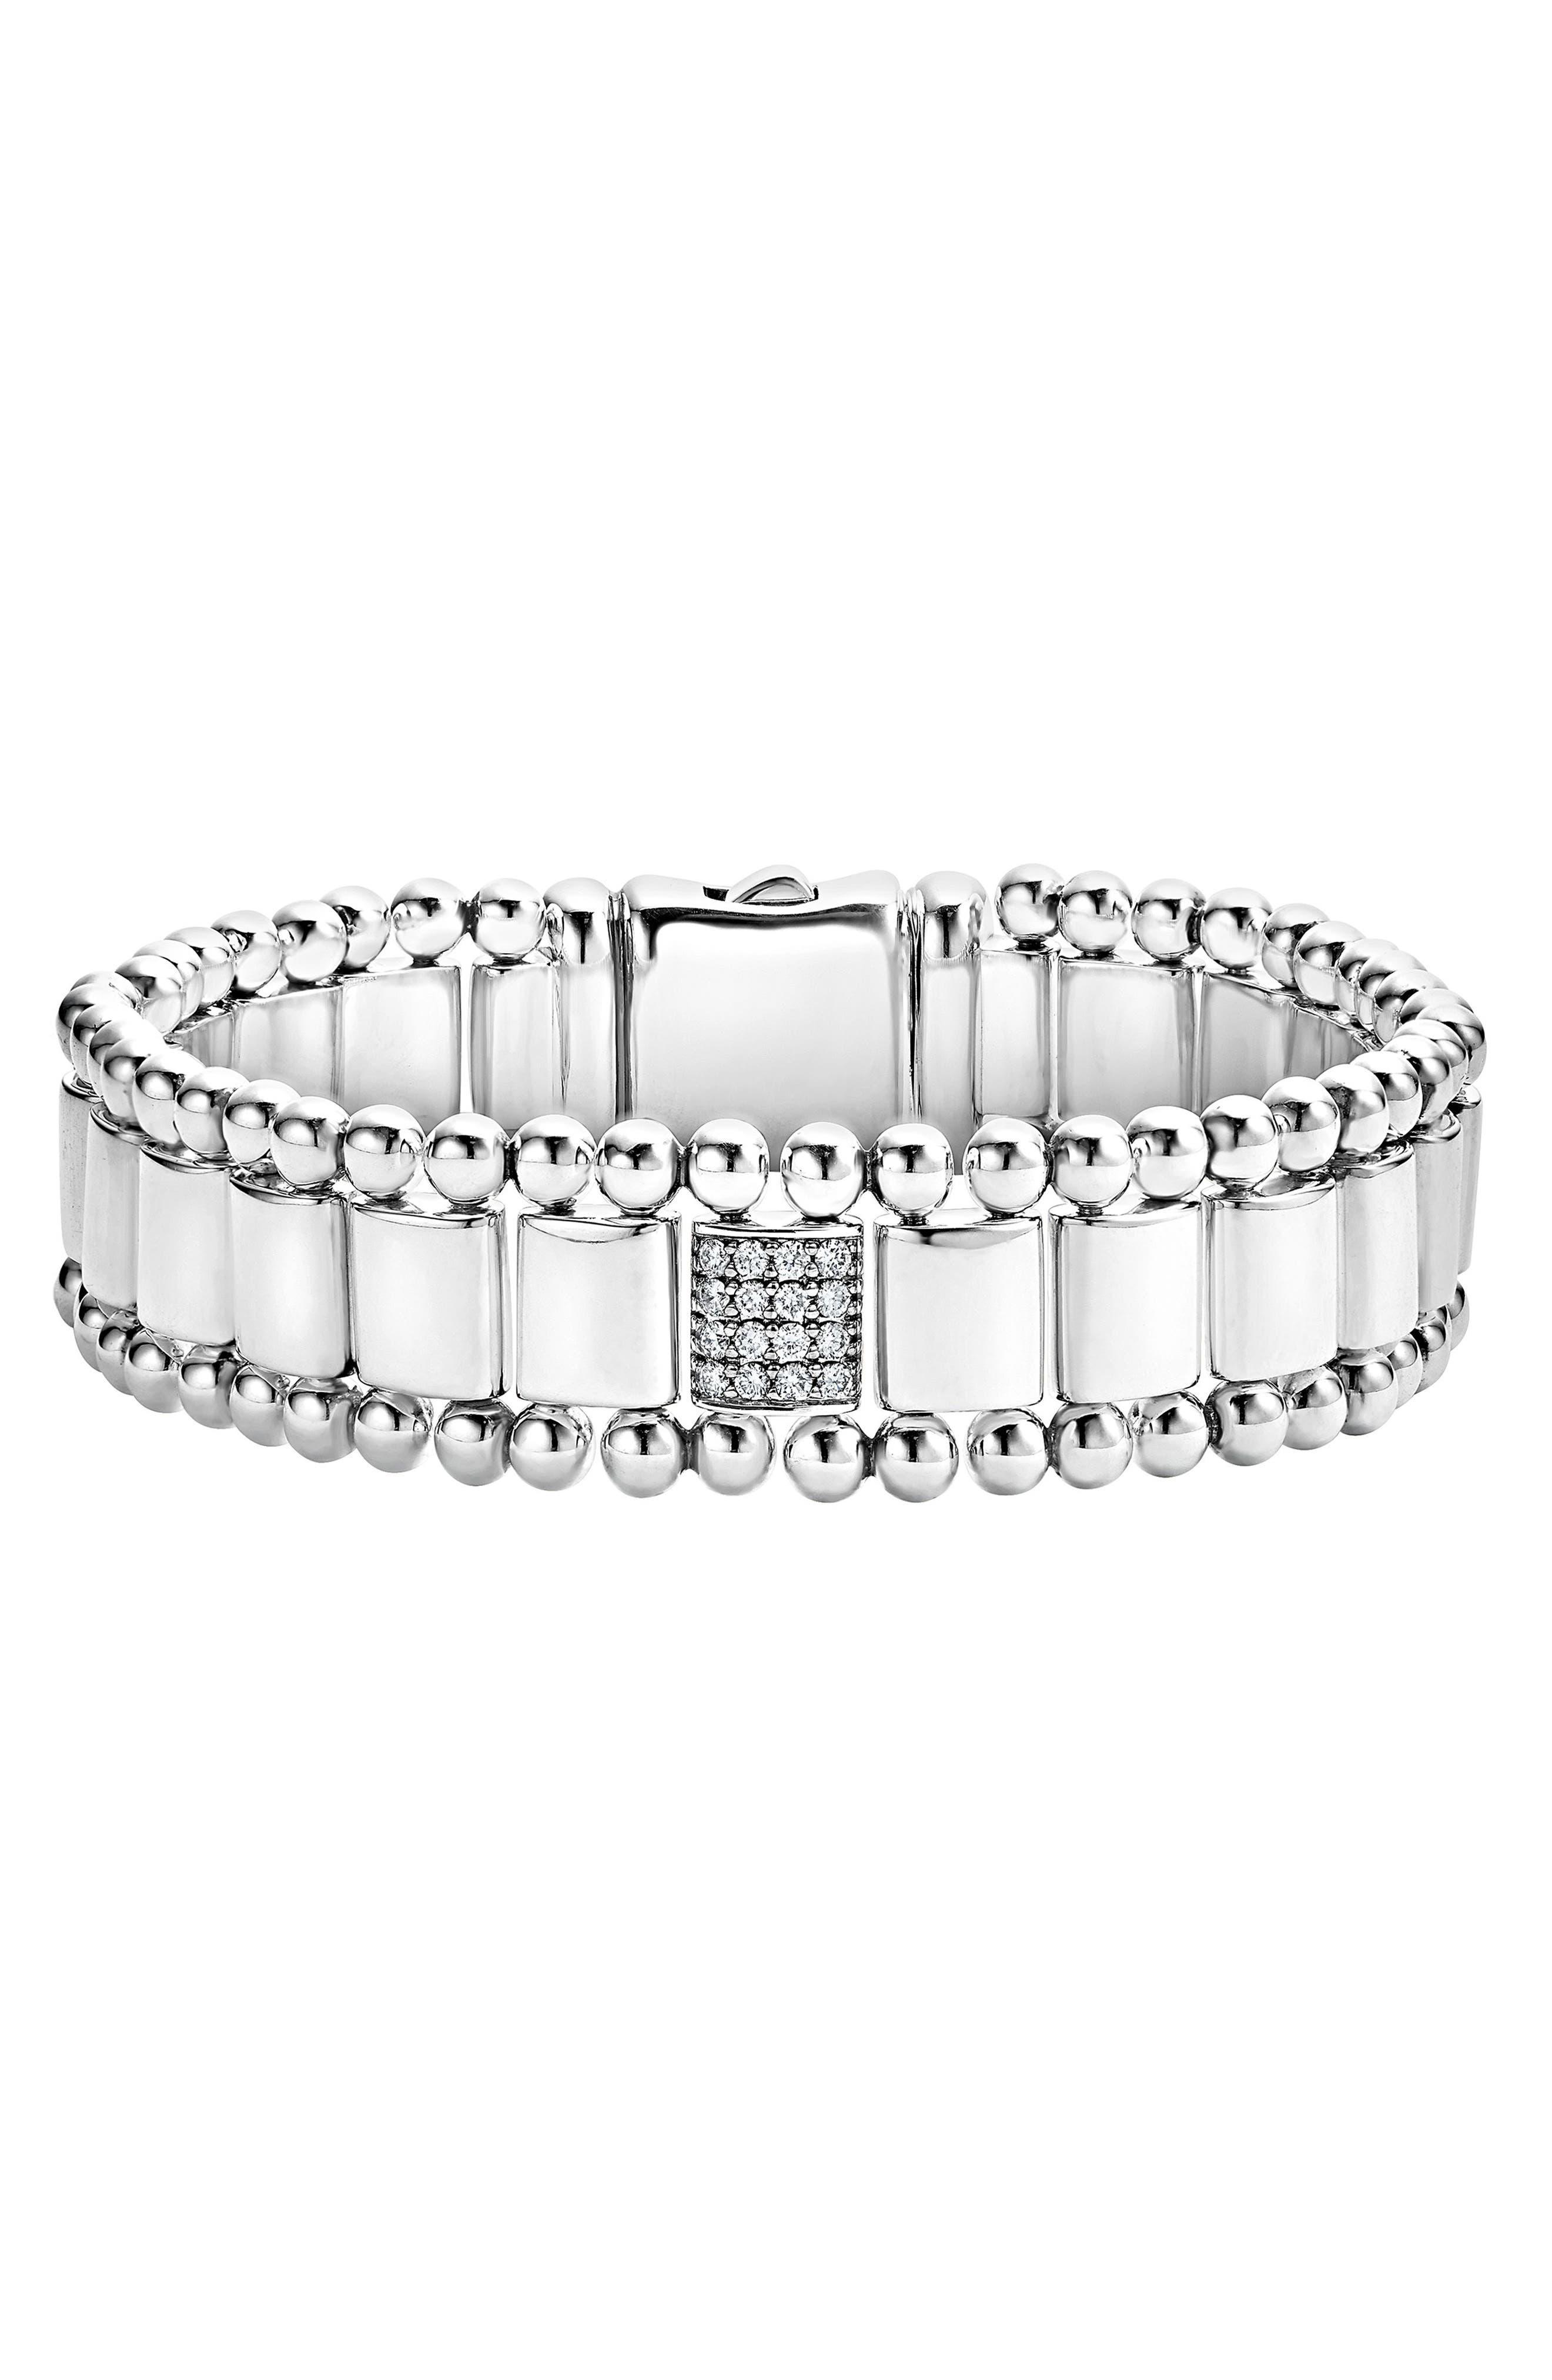 Caviar Spark Pavé Diamond Link Bracelet,                             Main thumbnail 1, color,                             SILVER/ DIAMOND